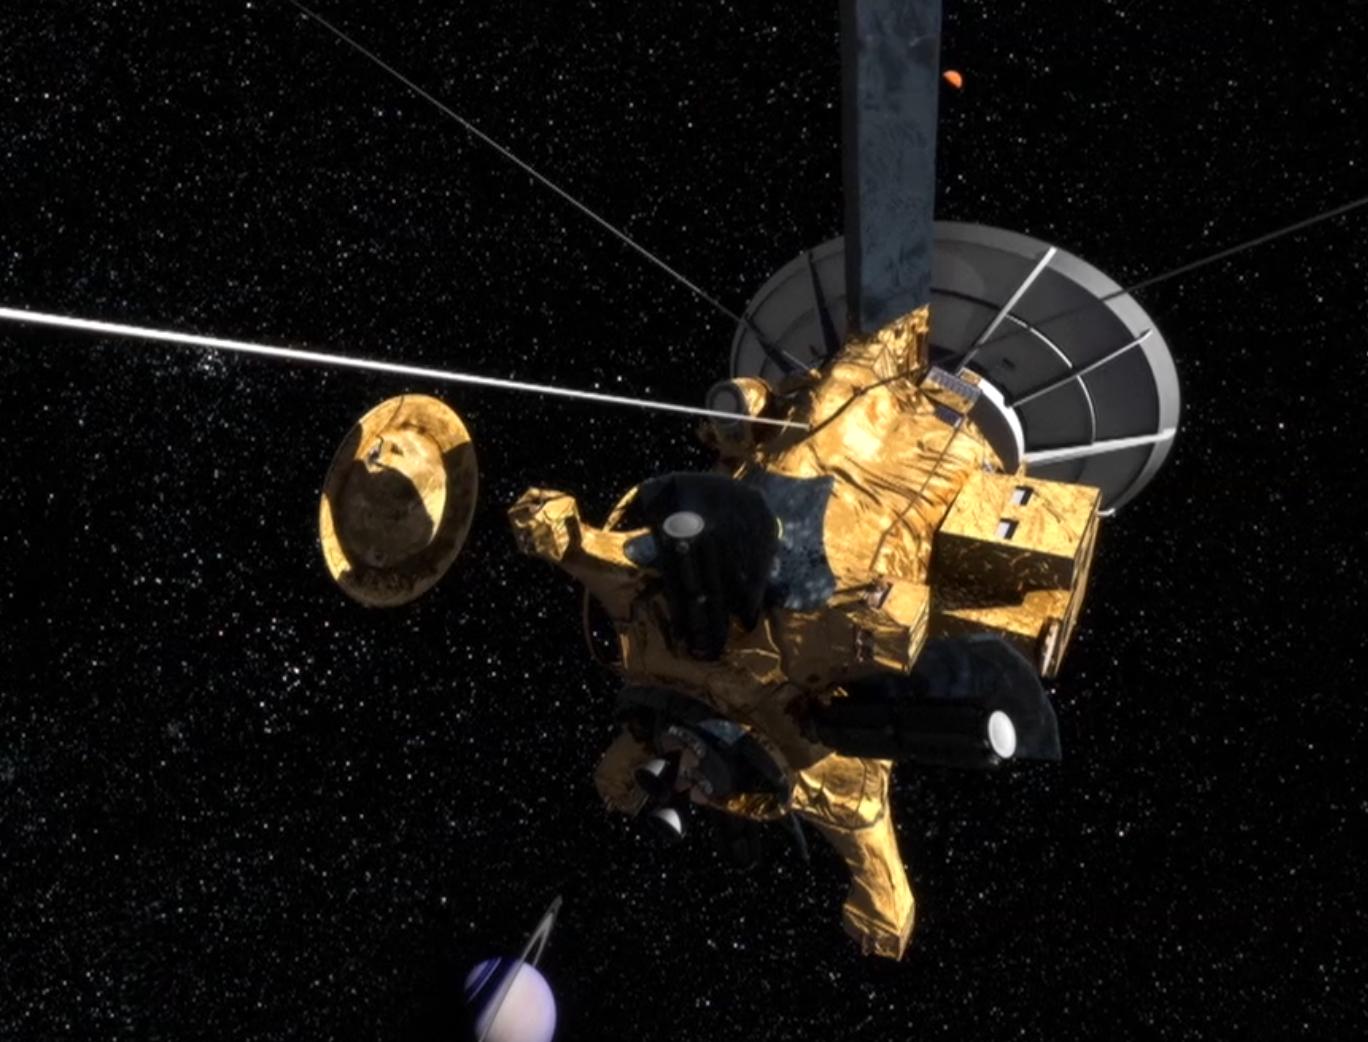 overview cassini nasa solar system exploration - HD1368×1042